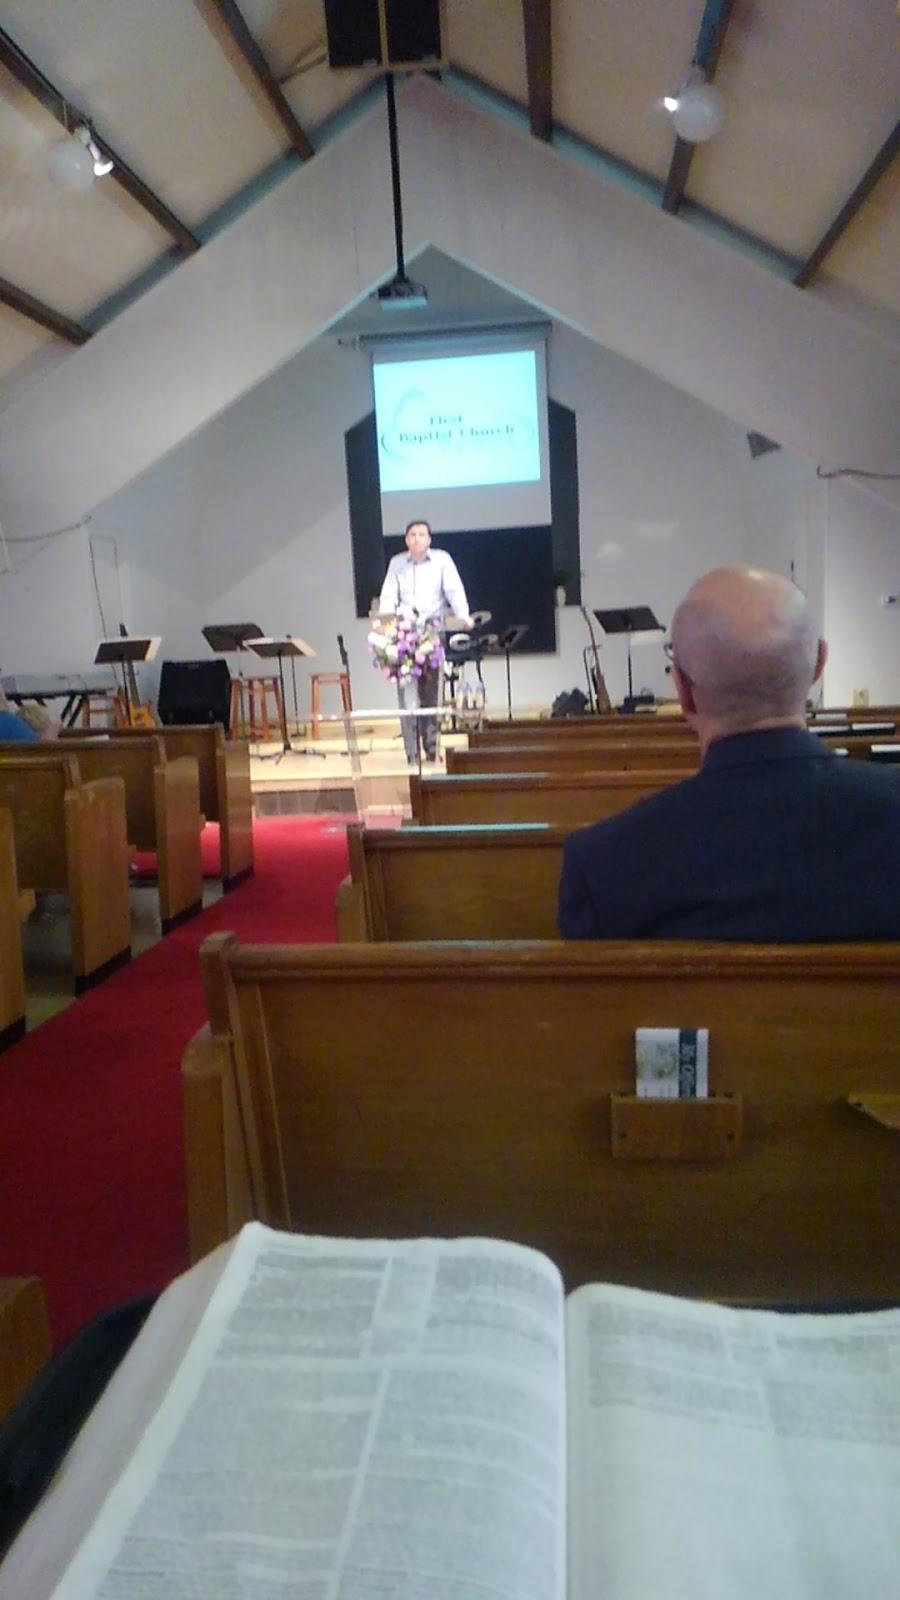 First Baptist Church of Venus - church  | Photo 1 of 2 | Address: 200 S Locust St, Venus, TX 76084, USA | Phone: (972) 885-9366